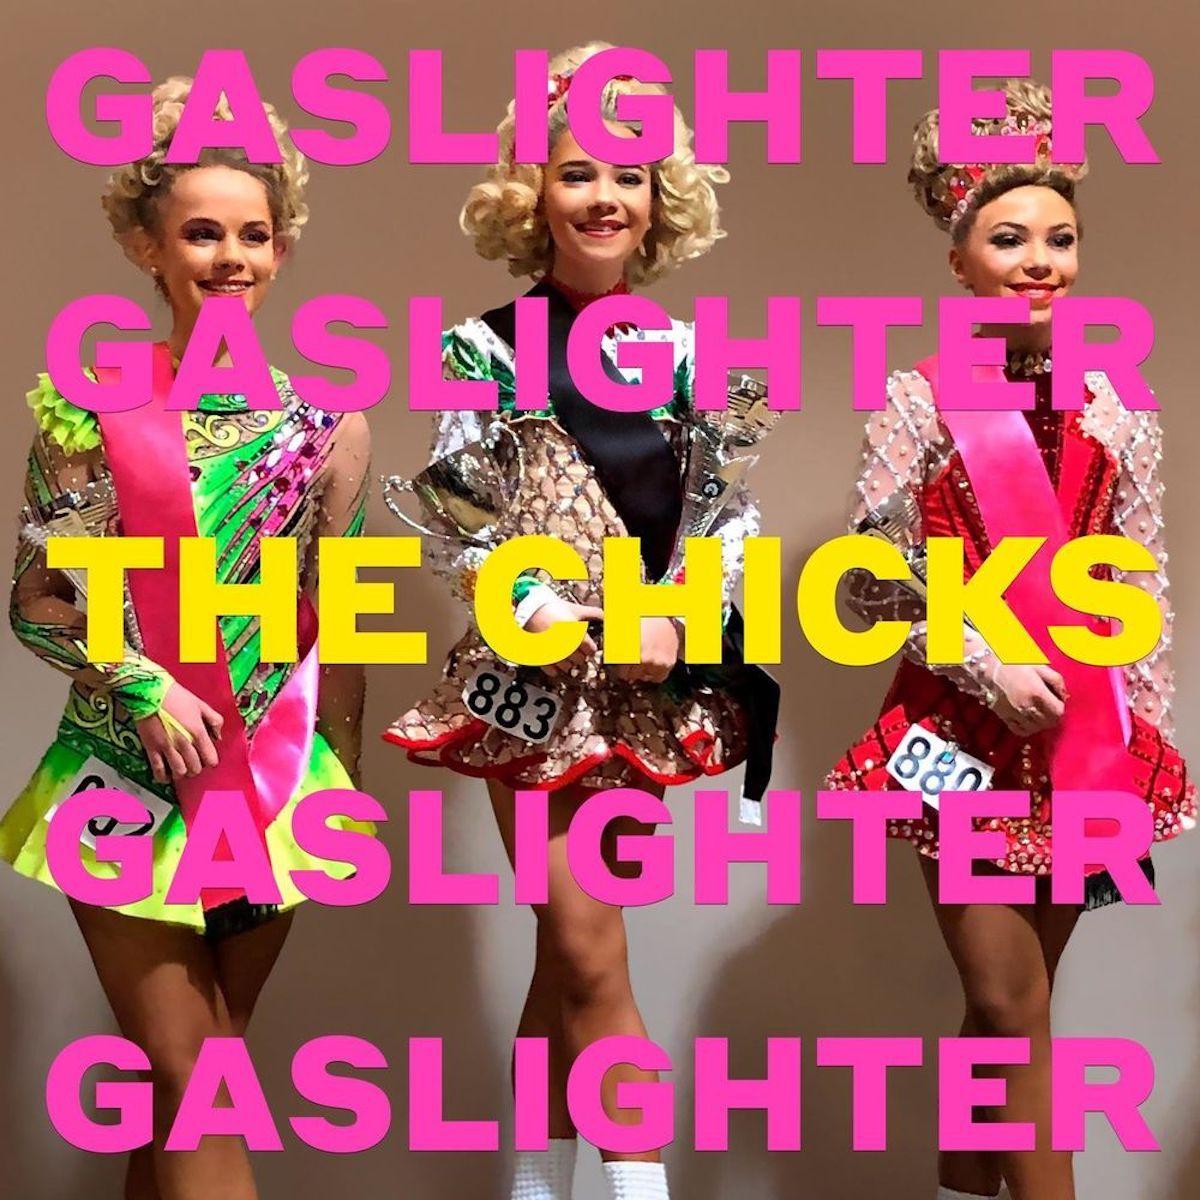 Gaslighter - The Chicks